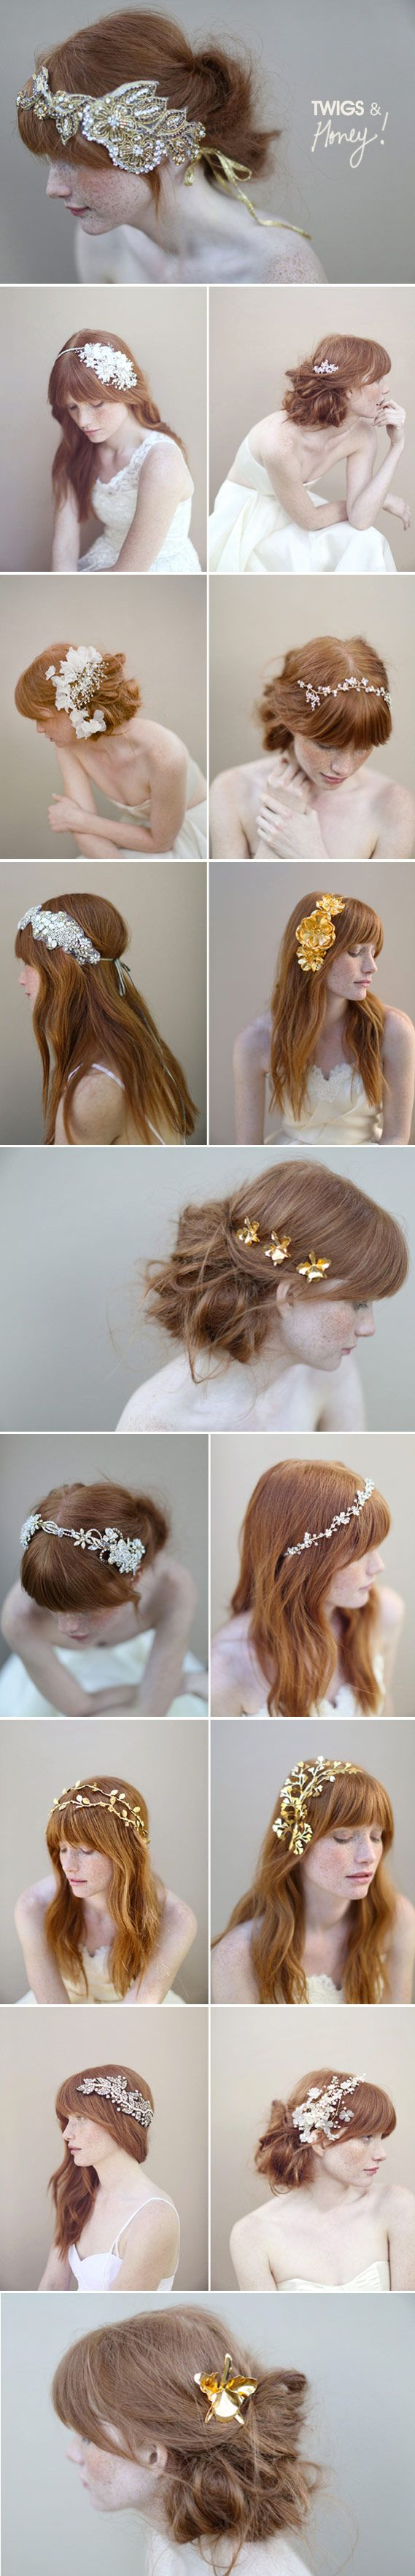 Br Bridal Headpieces Twigs And Honey - A arte de ashley longshore hair brainedbridal headpieceswedding